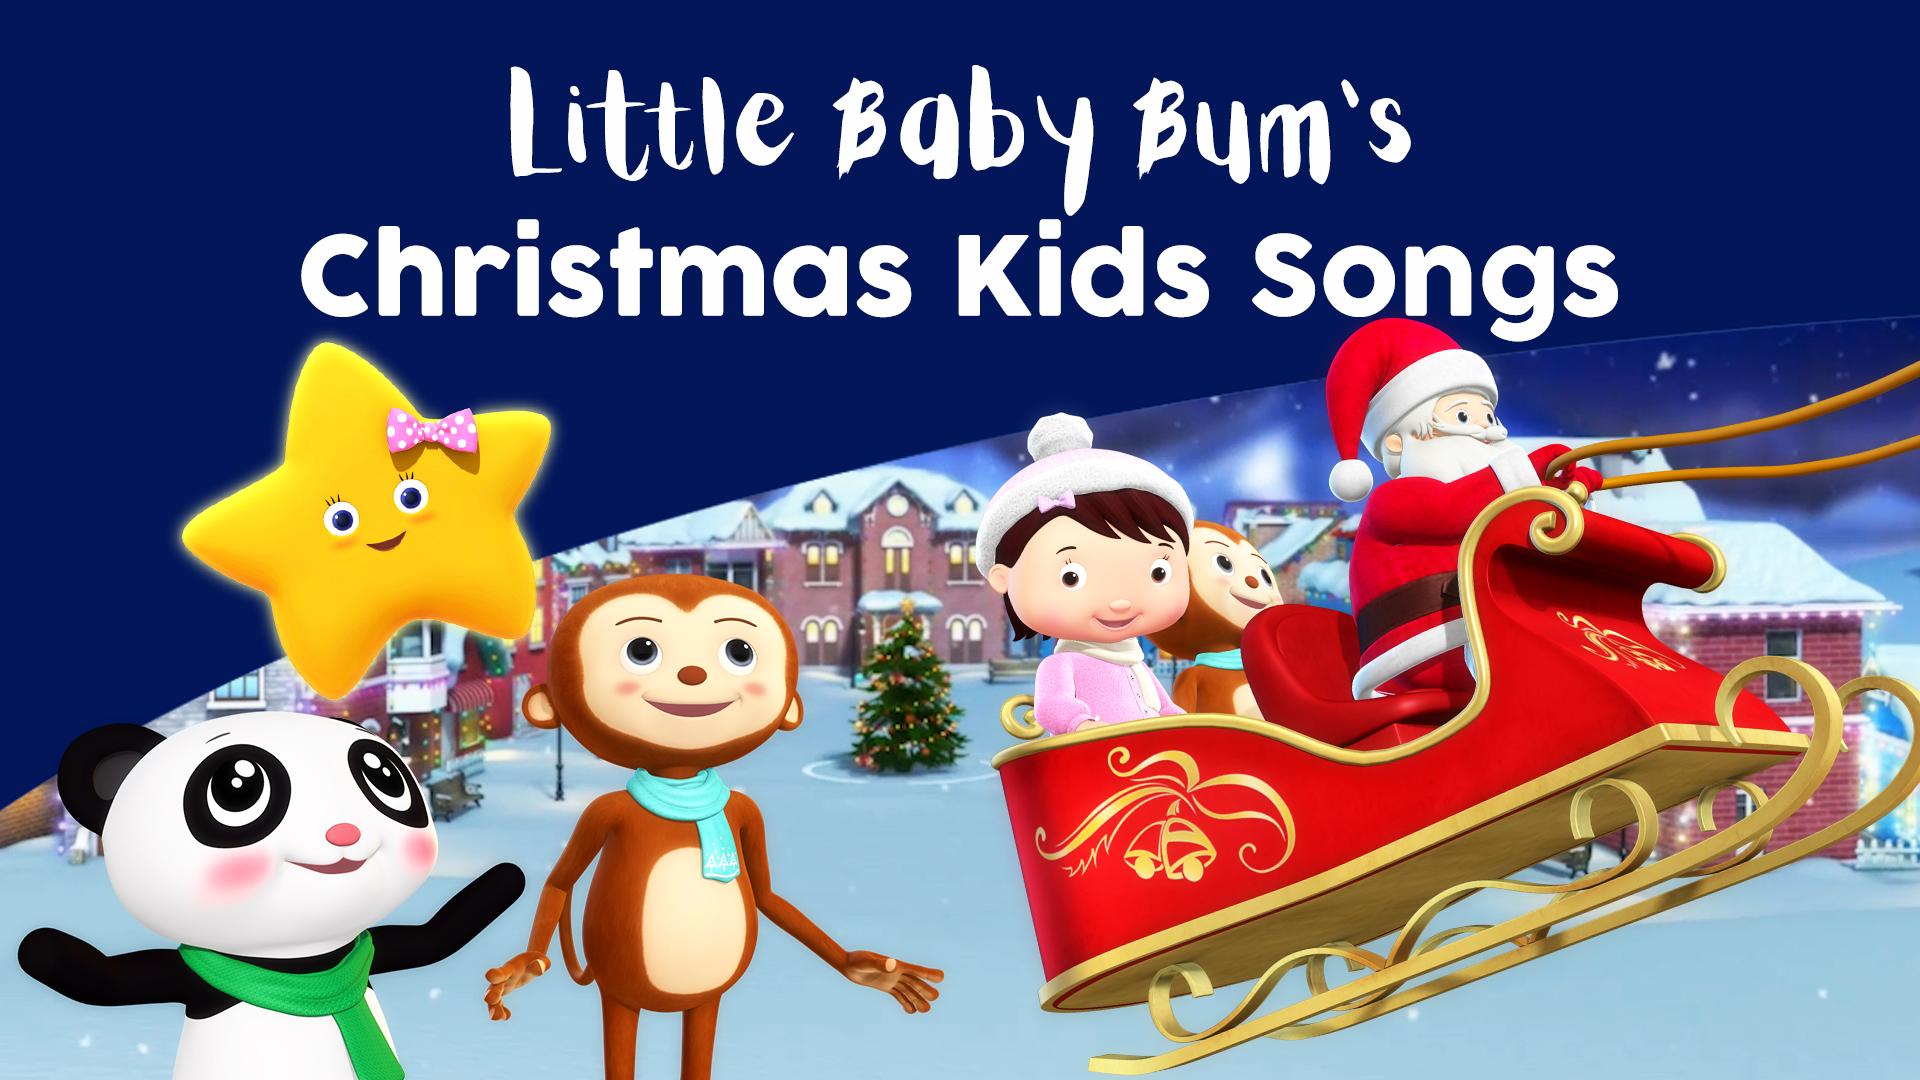 Little Baby Bum's Christmas Kids Songs